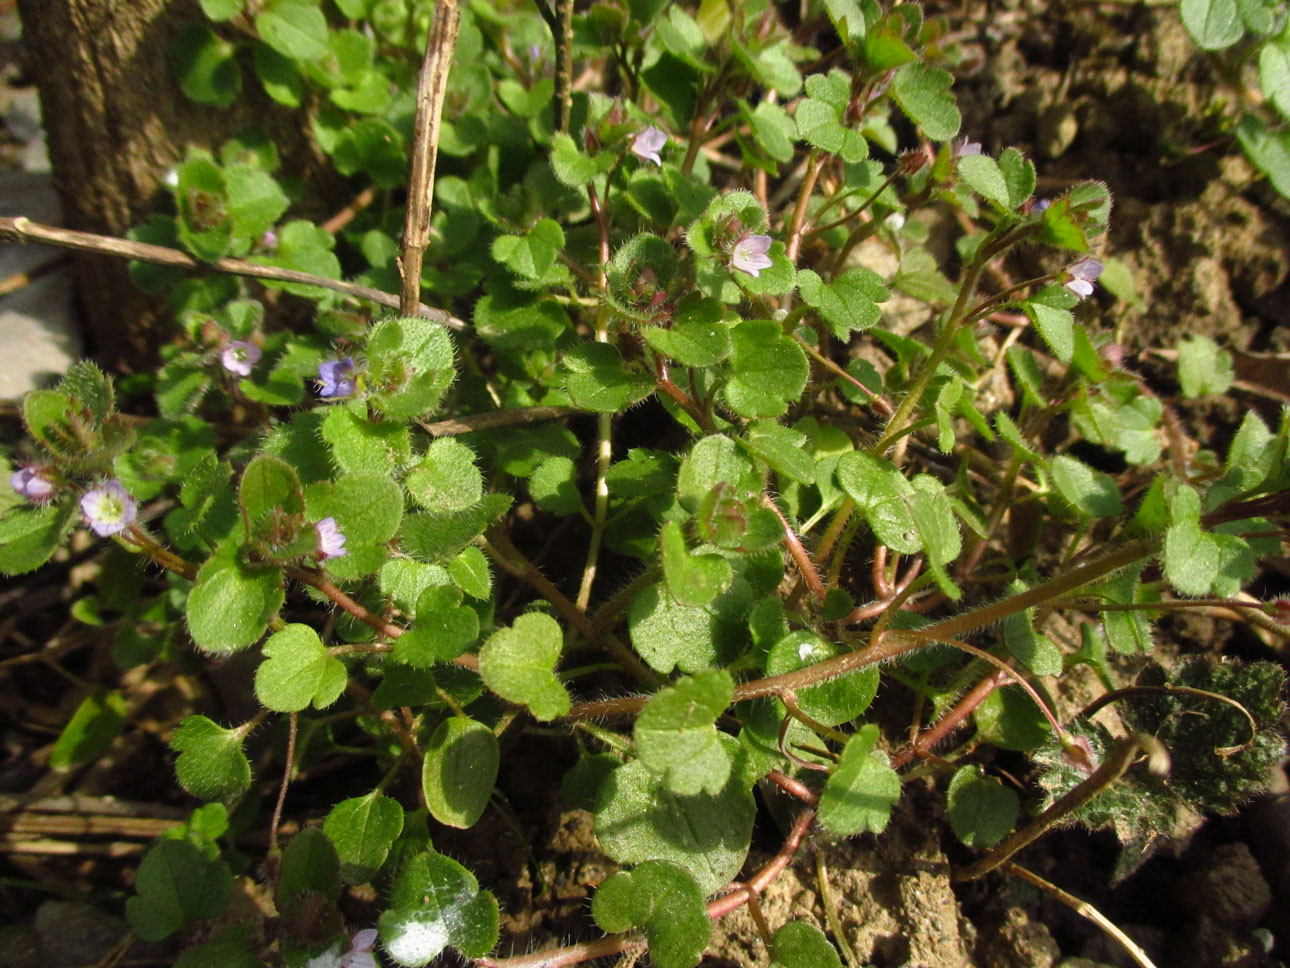 Hain-Ehrenpreis (Veronica sublobata) | Familie: Ehrenpreisgewächse (Veronicaceae)